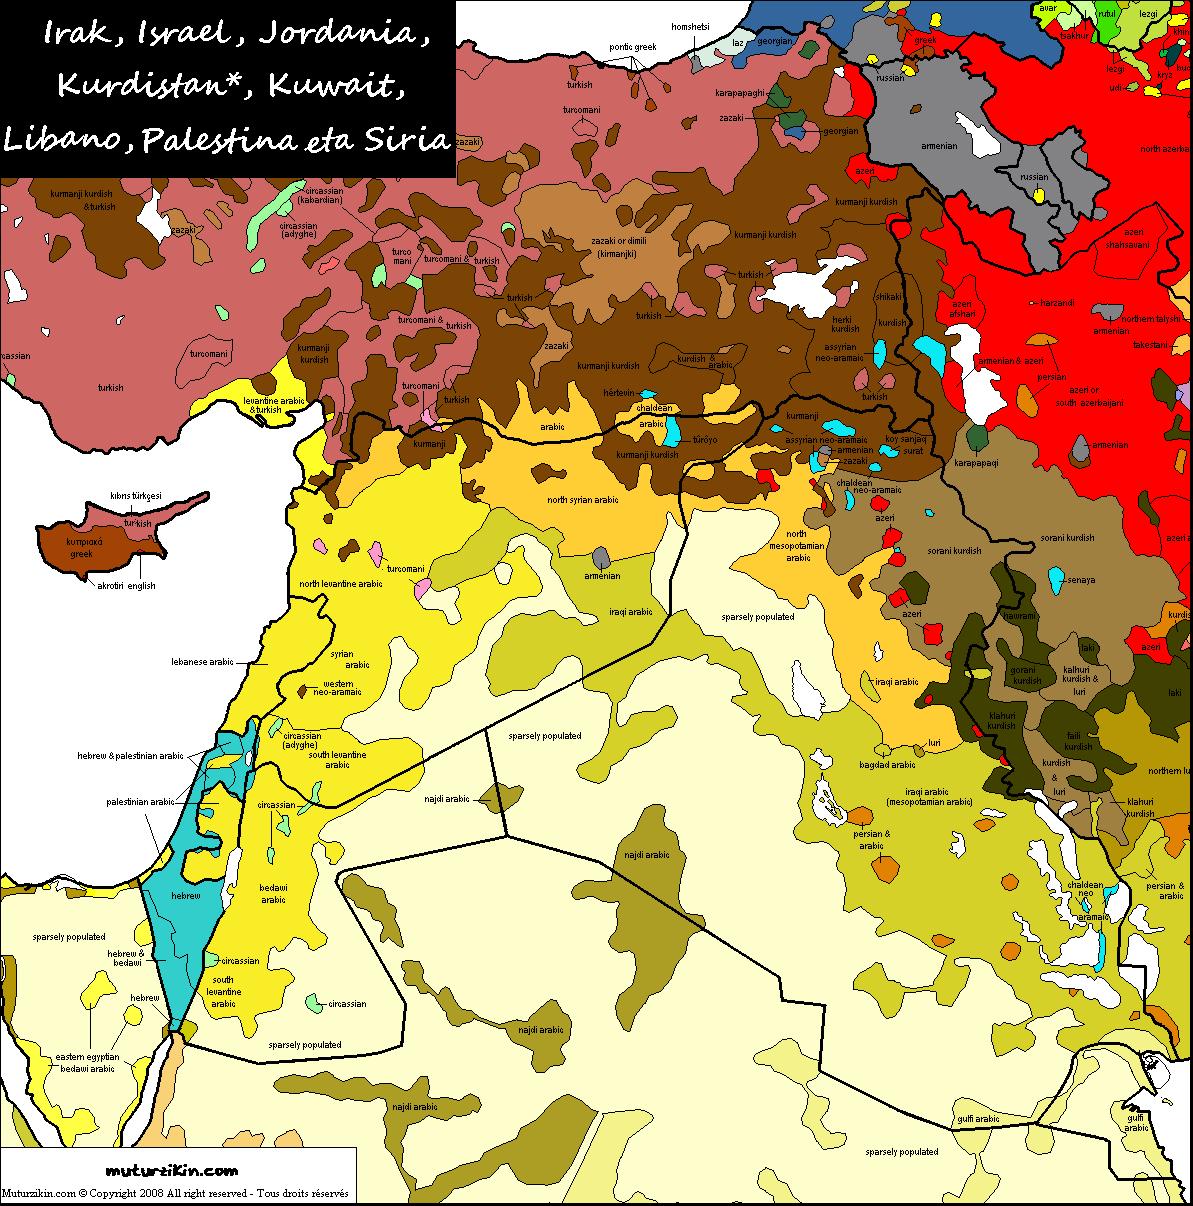 irak israel jordania kuwait lebanon palestine syria carte linguistique linguistic map